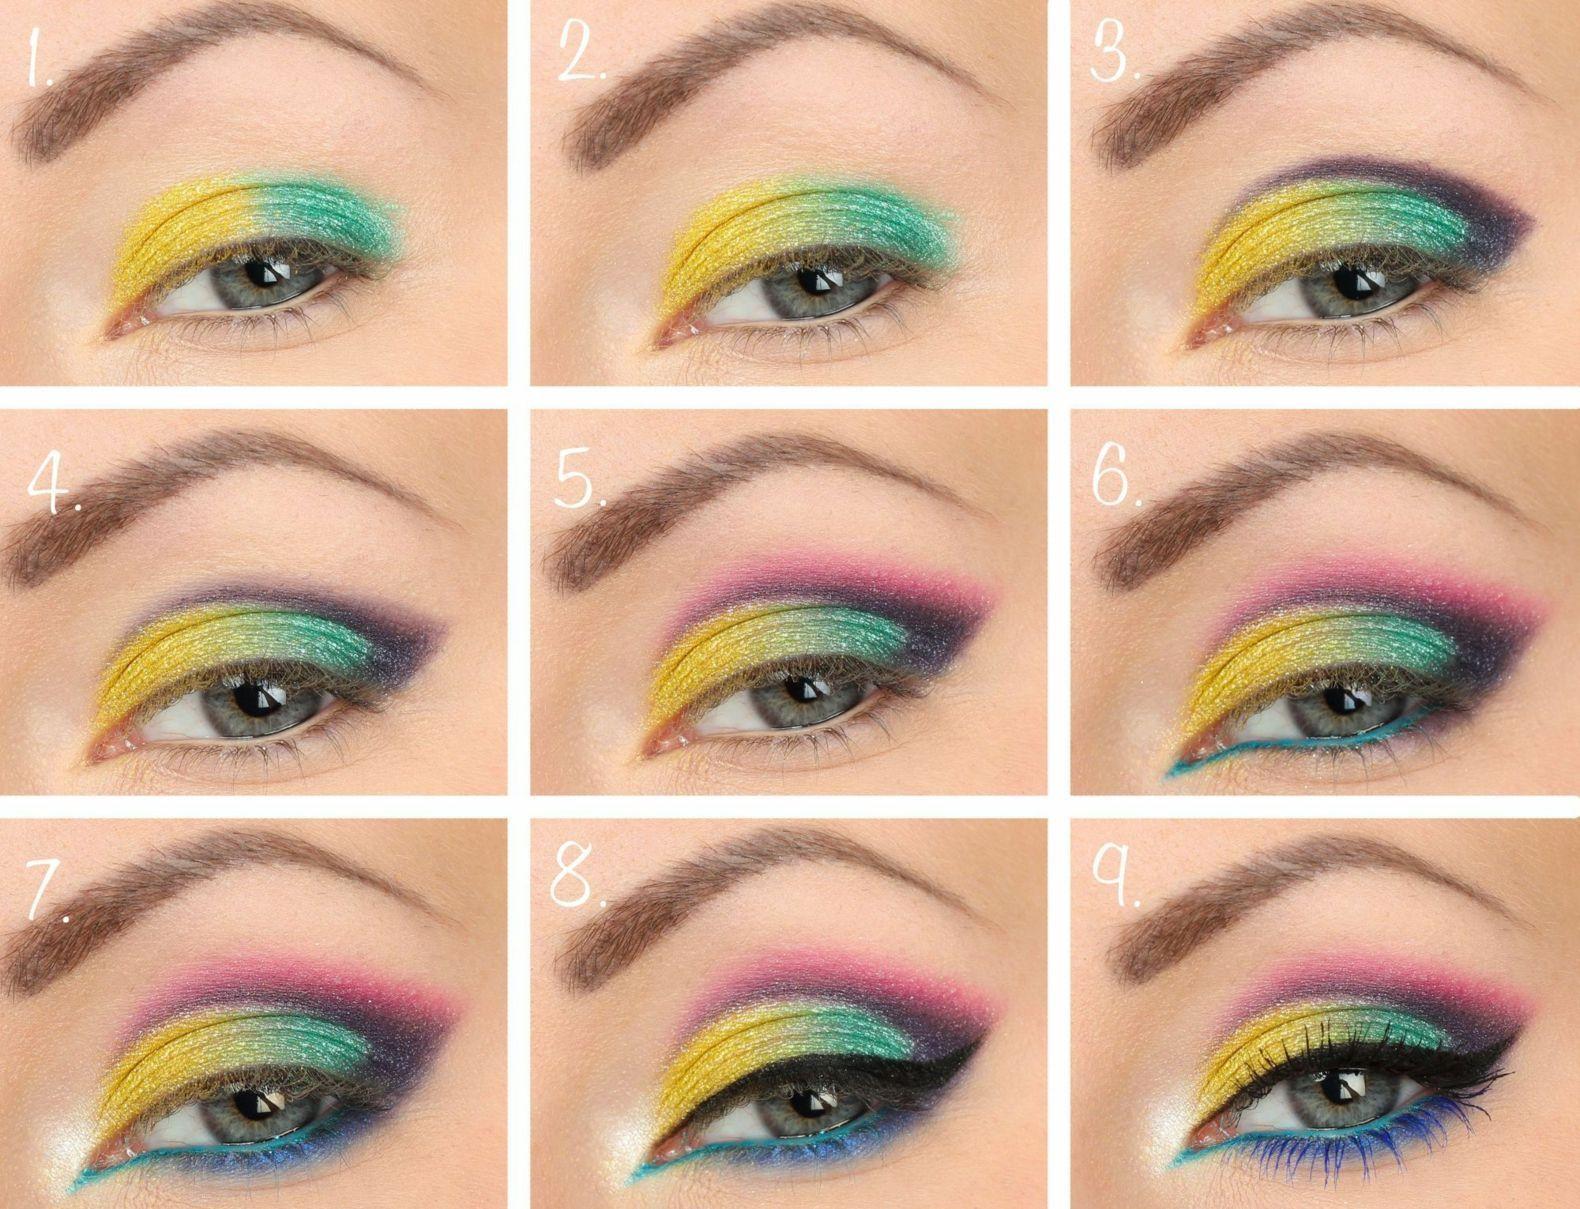 80s Makeup Neonfarben Lidschatten 80er Jahre Makeup Anleitung